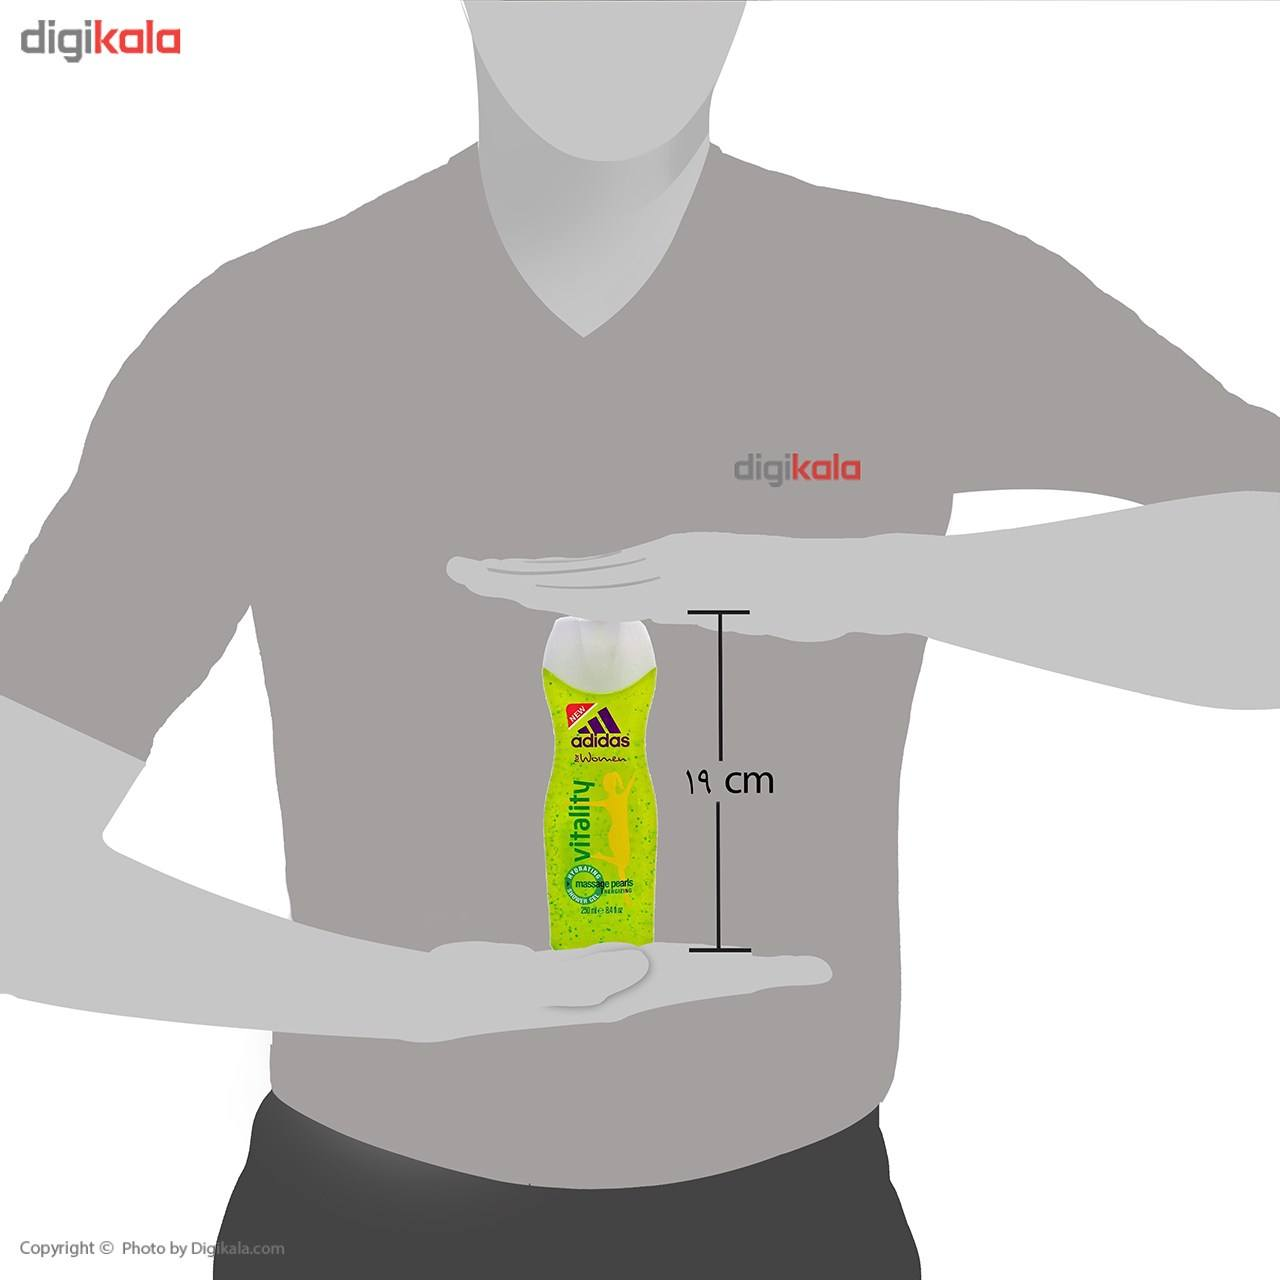 شامپو بدن زنانه آدیداس مدل Vitality حجم 250 میلی لیتر main 1 4